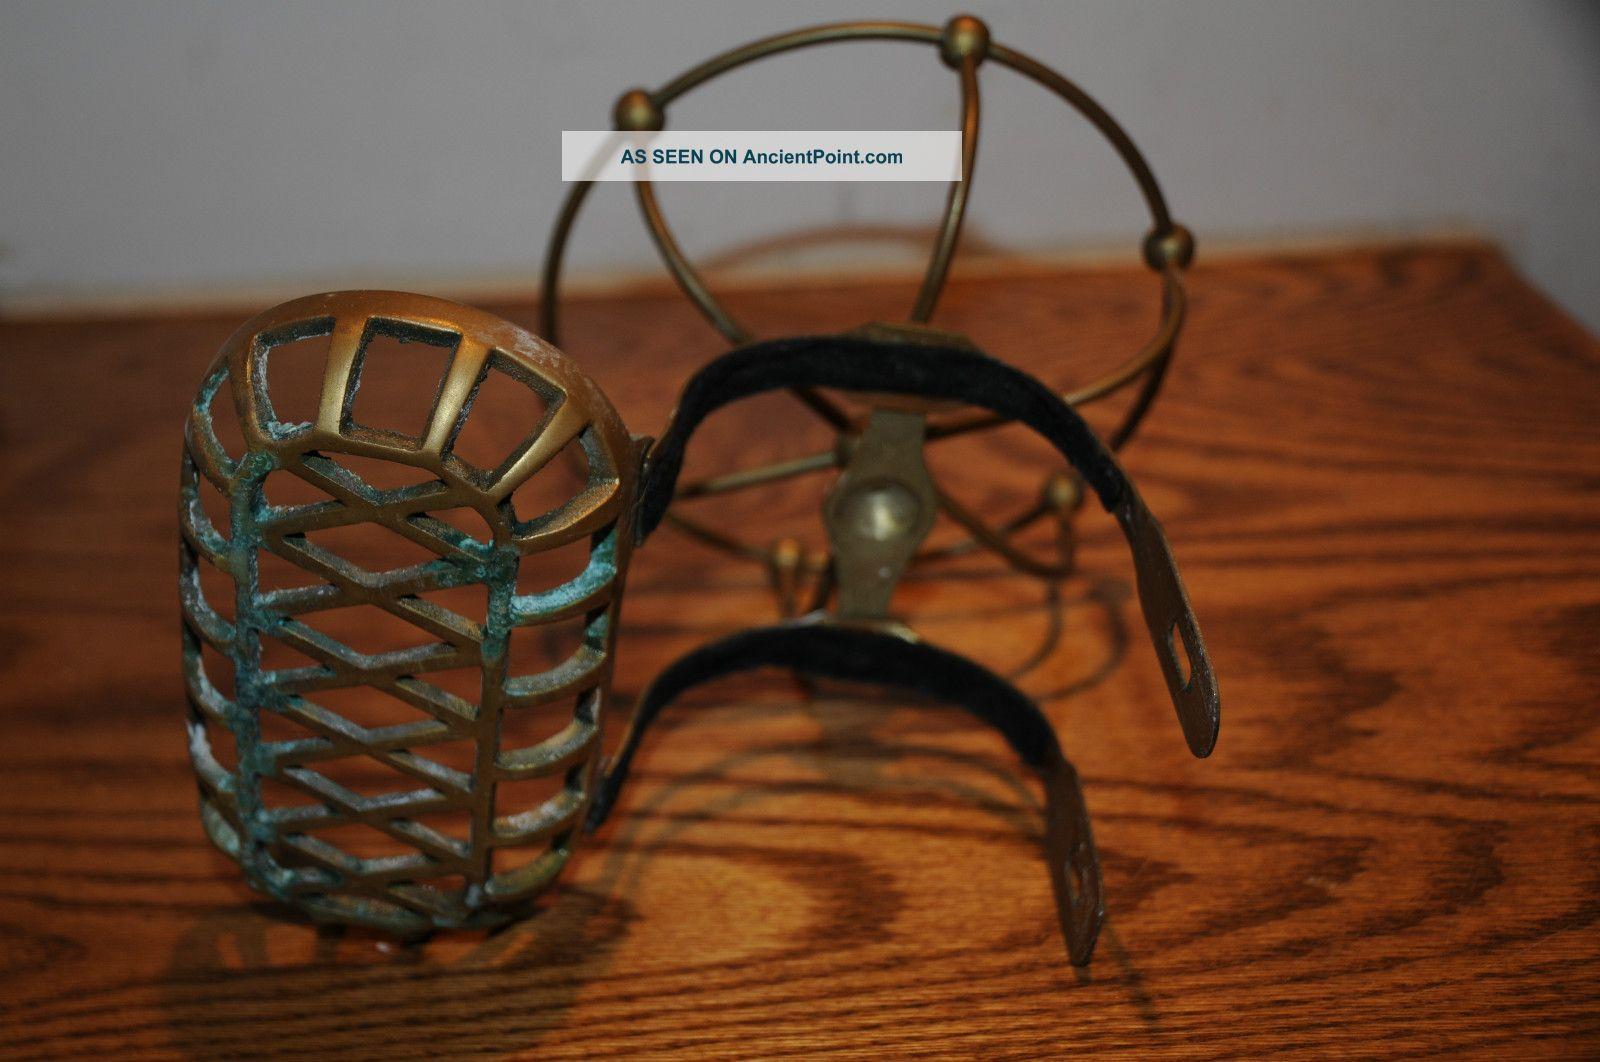 Antique Victorian Brass Soap Dish & Sponge Holder Claw Foot Bath Tub ...